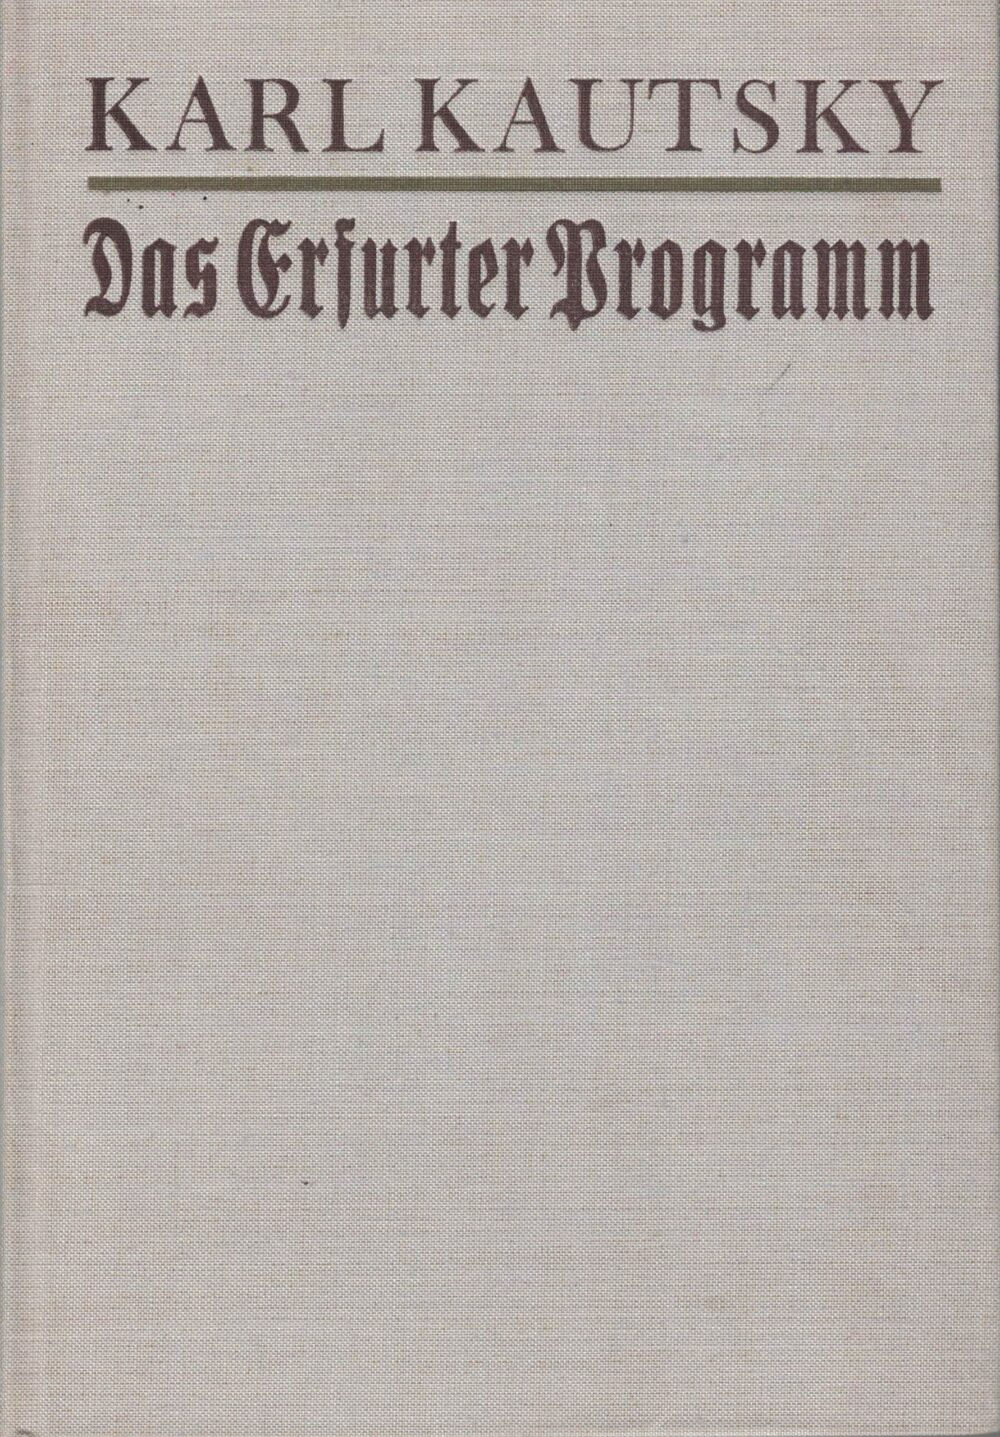 Karl Kautsky - Das Erfurter Programm